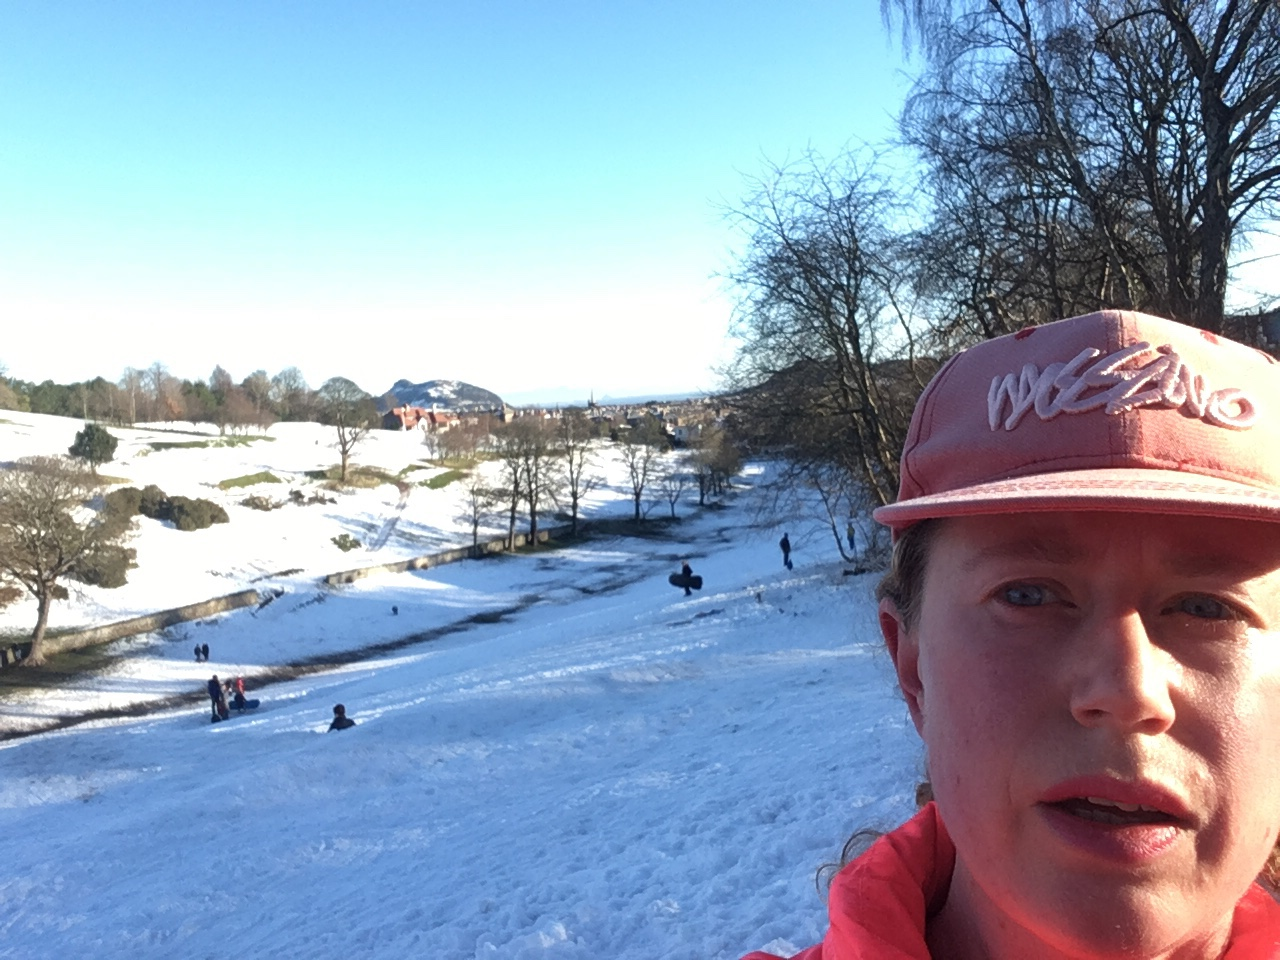 Woman in Run Selfie with snowy Edinburgh scene in the background.